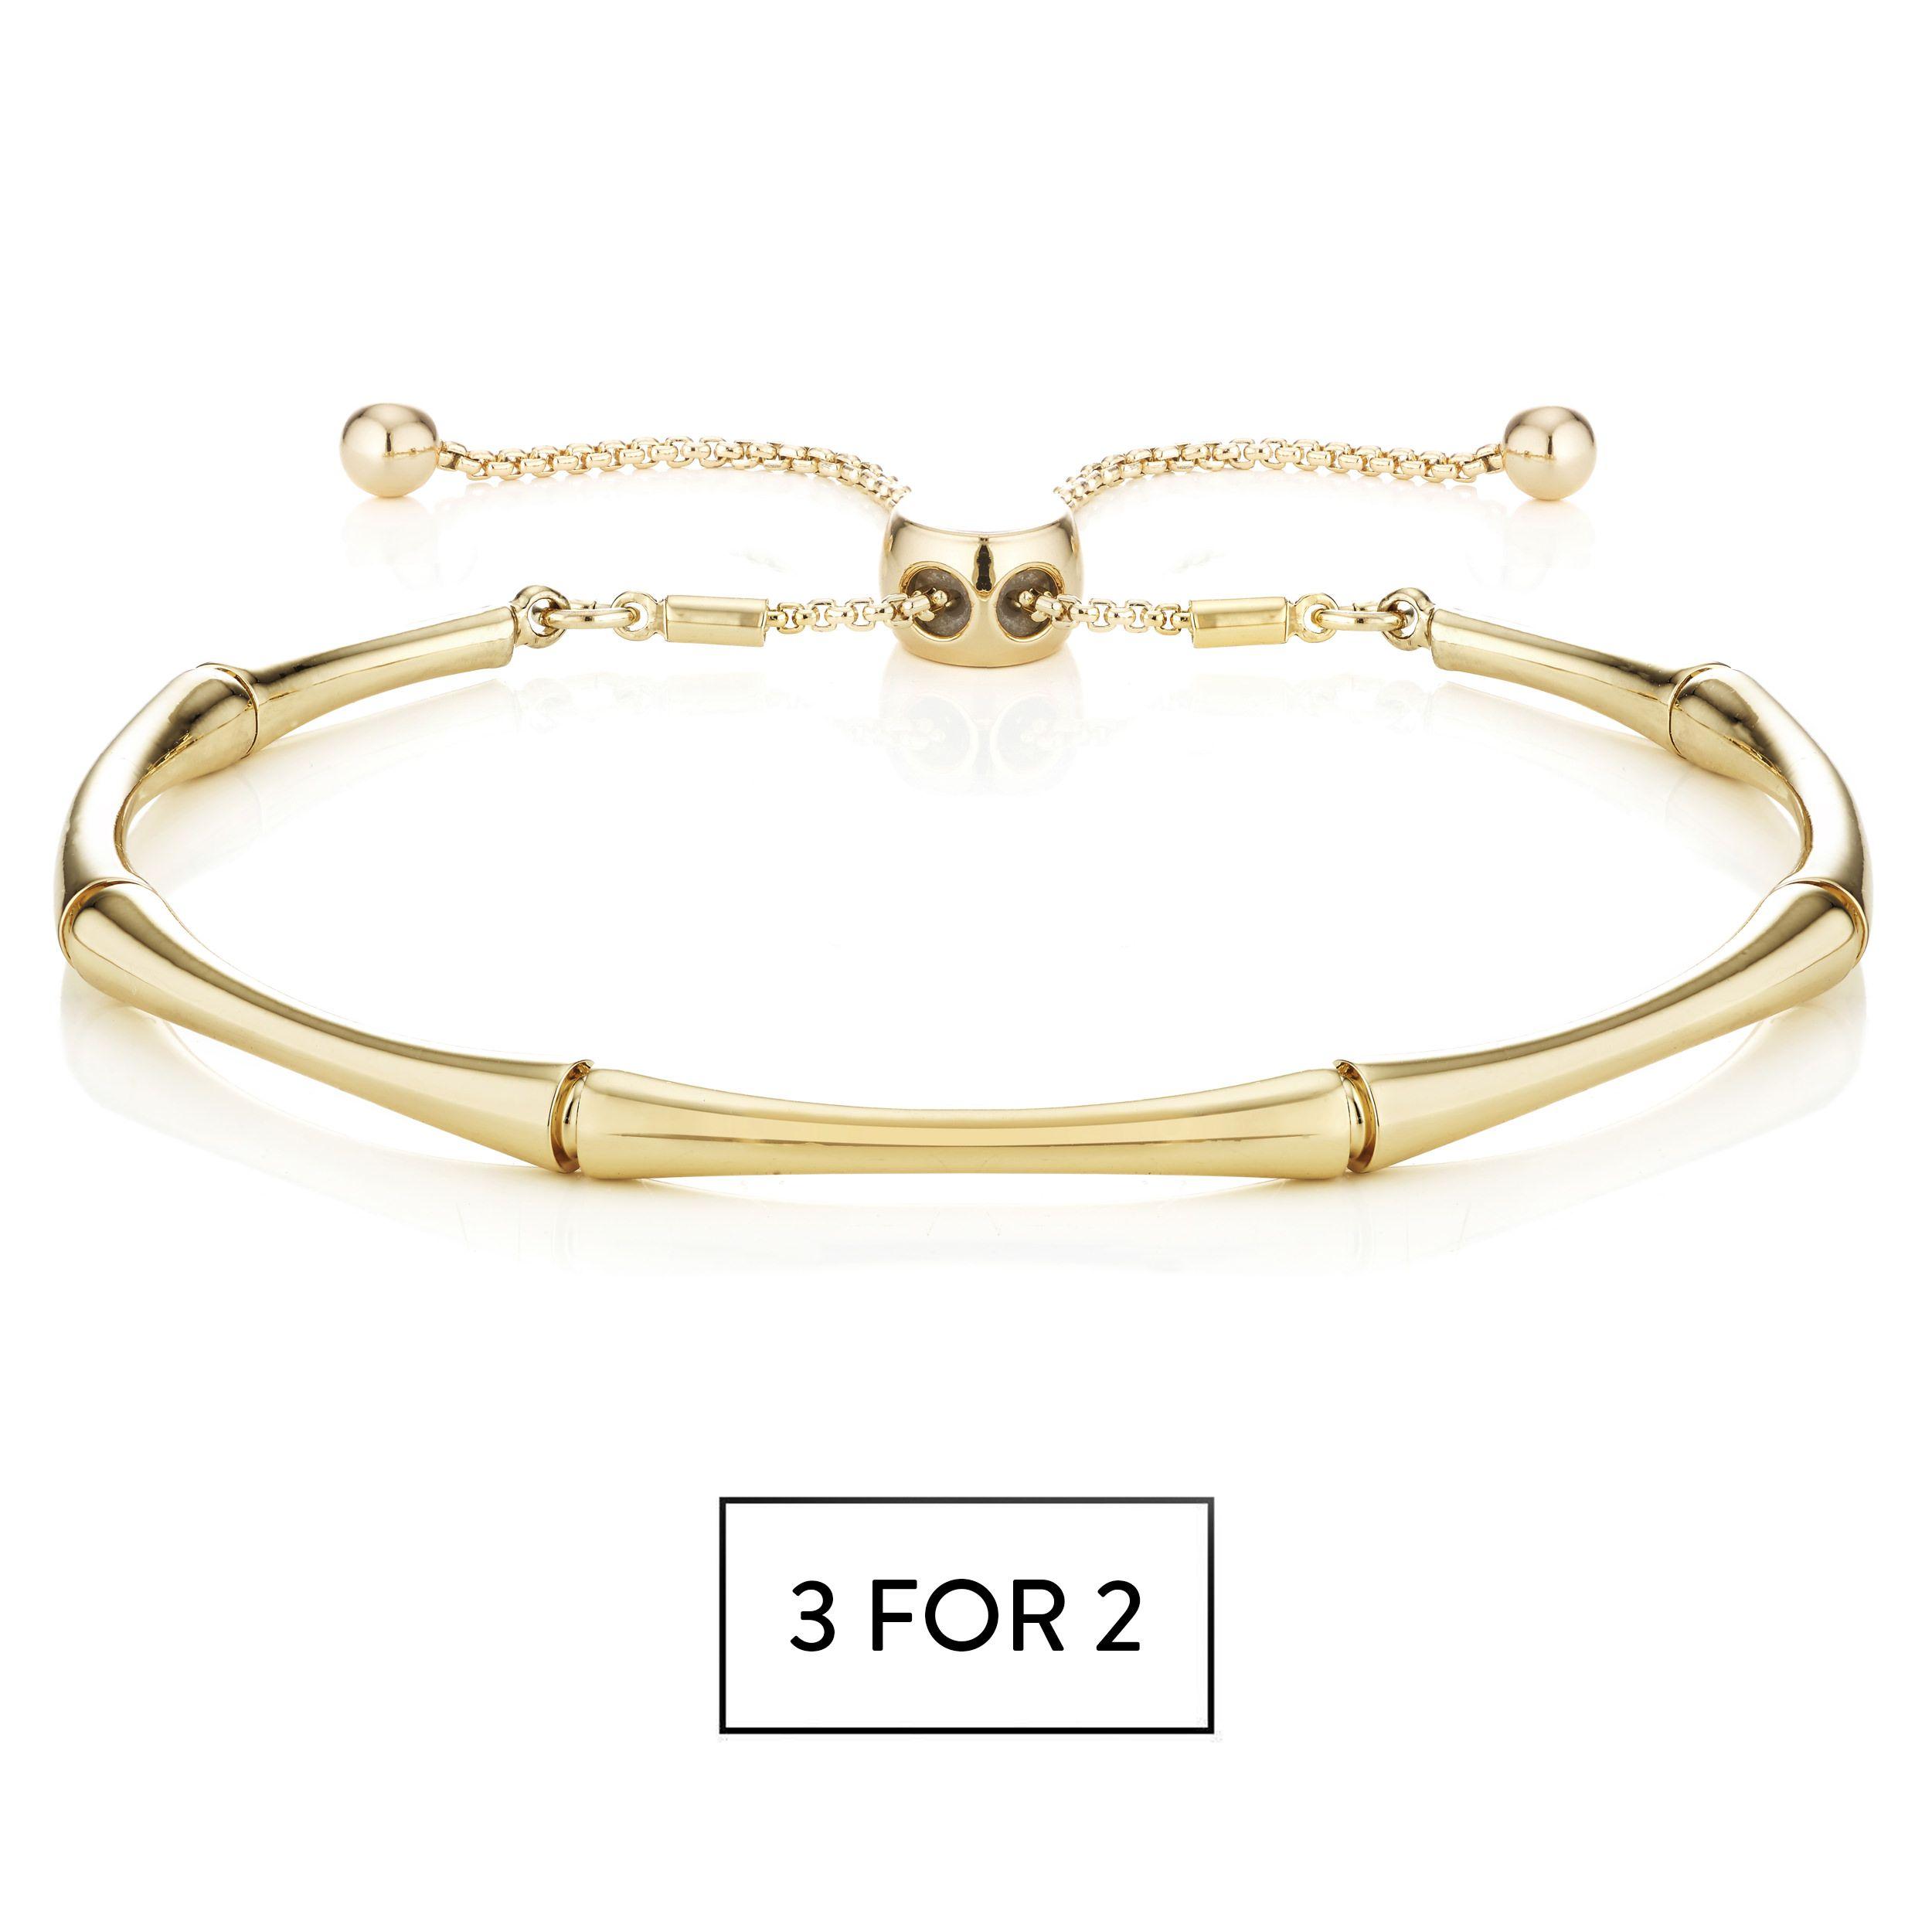 Buckley London Bamboo Bracelet - Gold